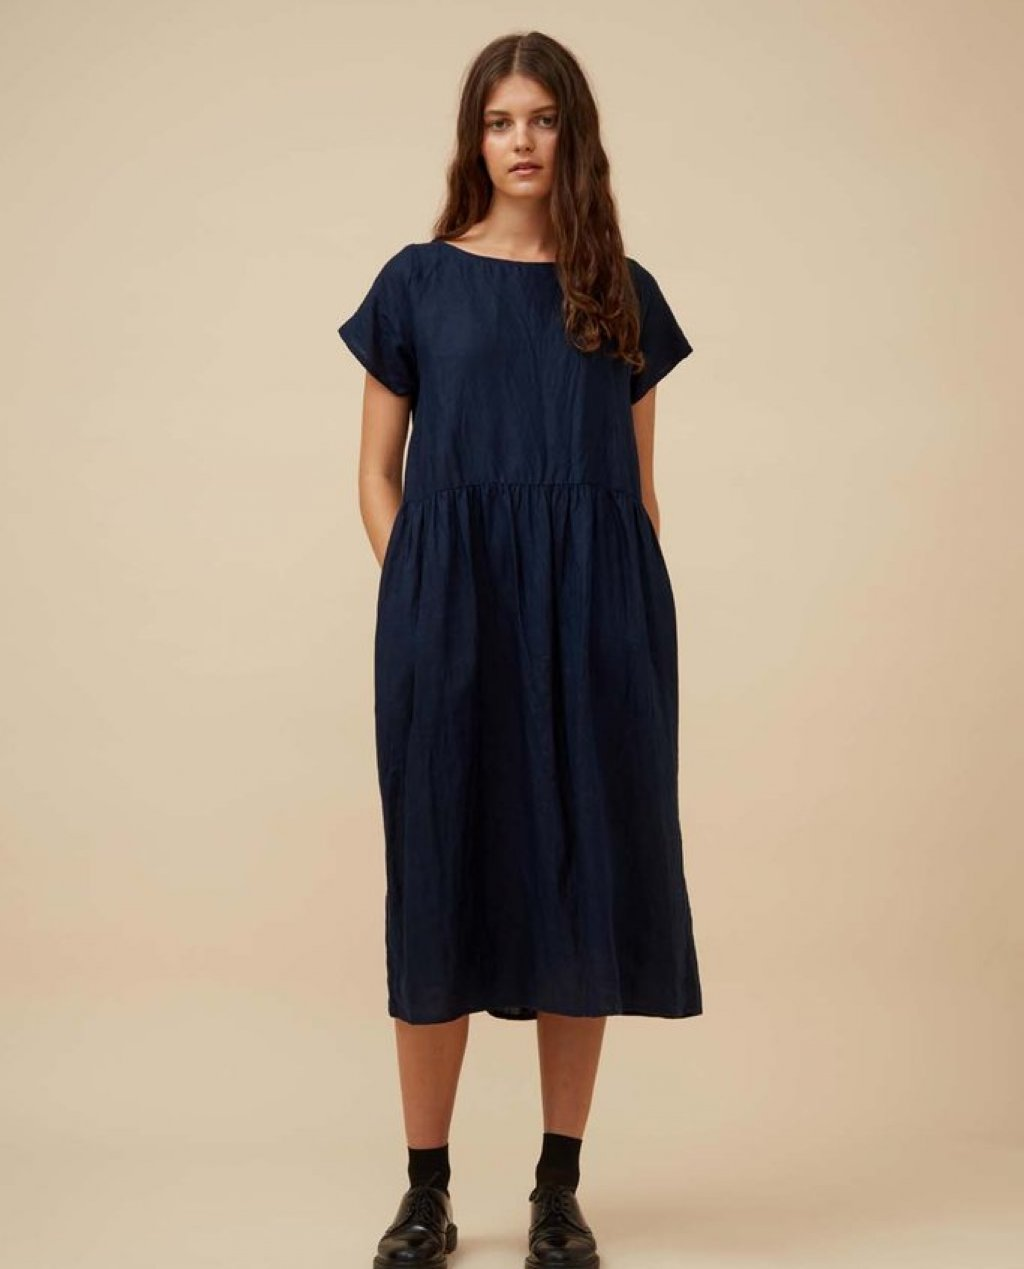 Widdess - Atlanta Dress - Linen - Indigo